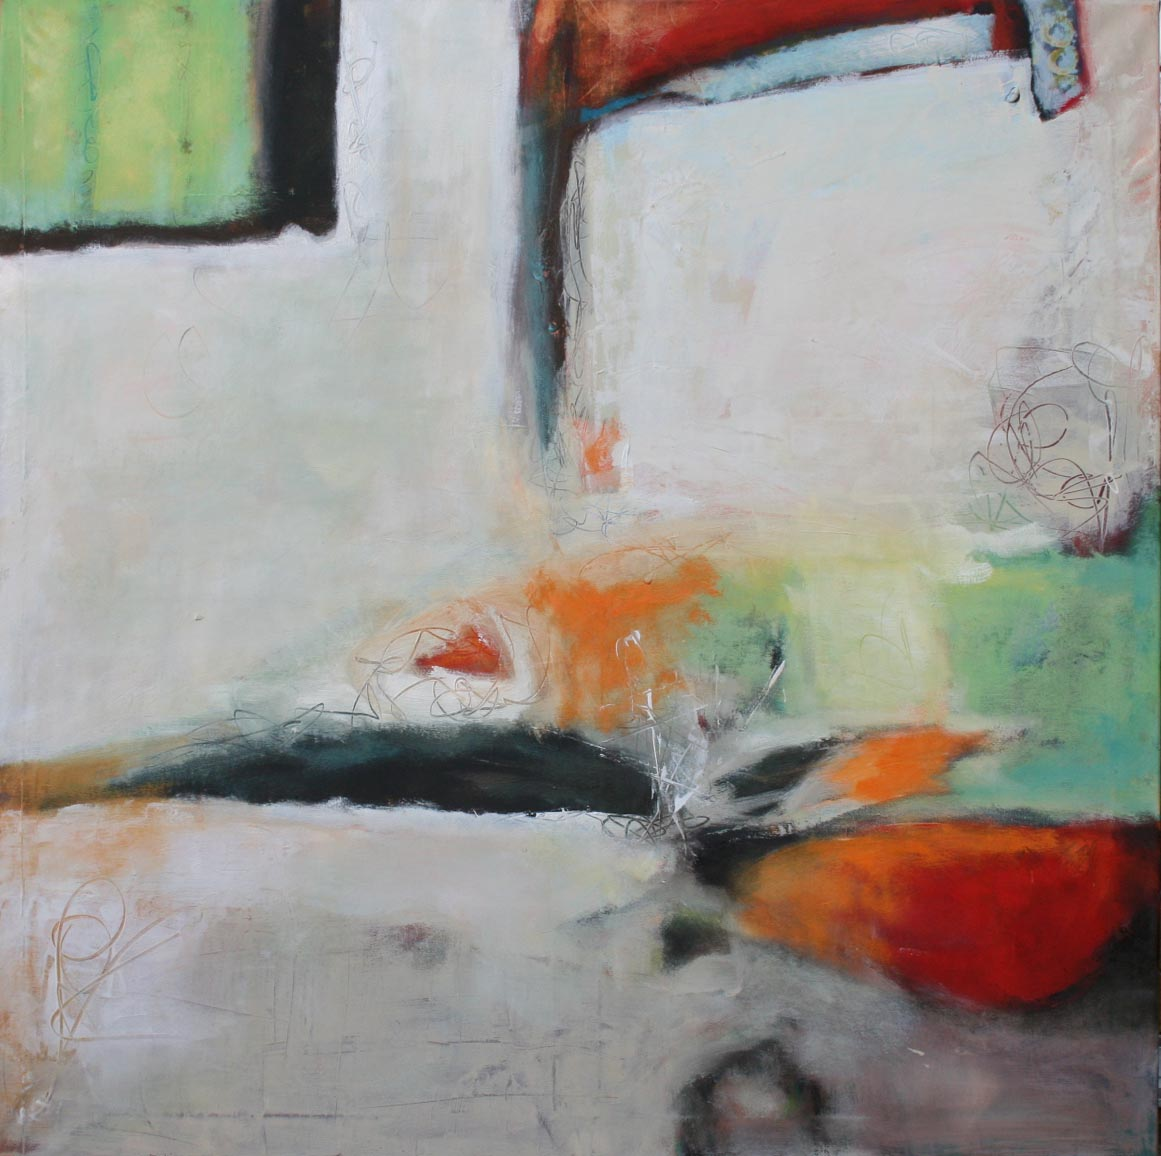 Ohne Titel 1703, Öl und Acryl auf Leinwand, 100 x 100 cm